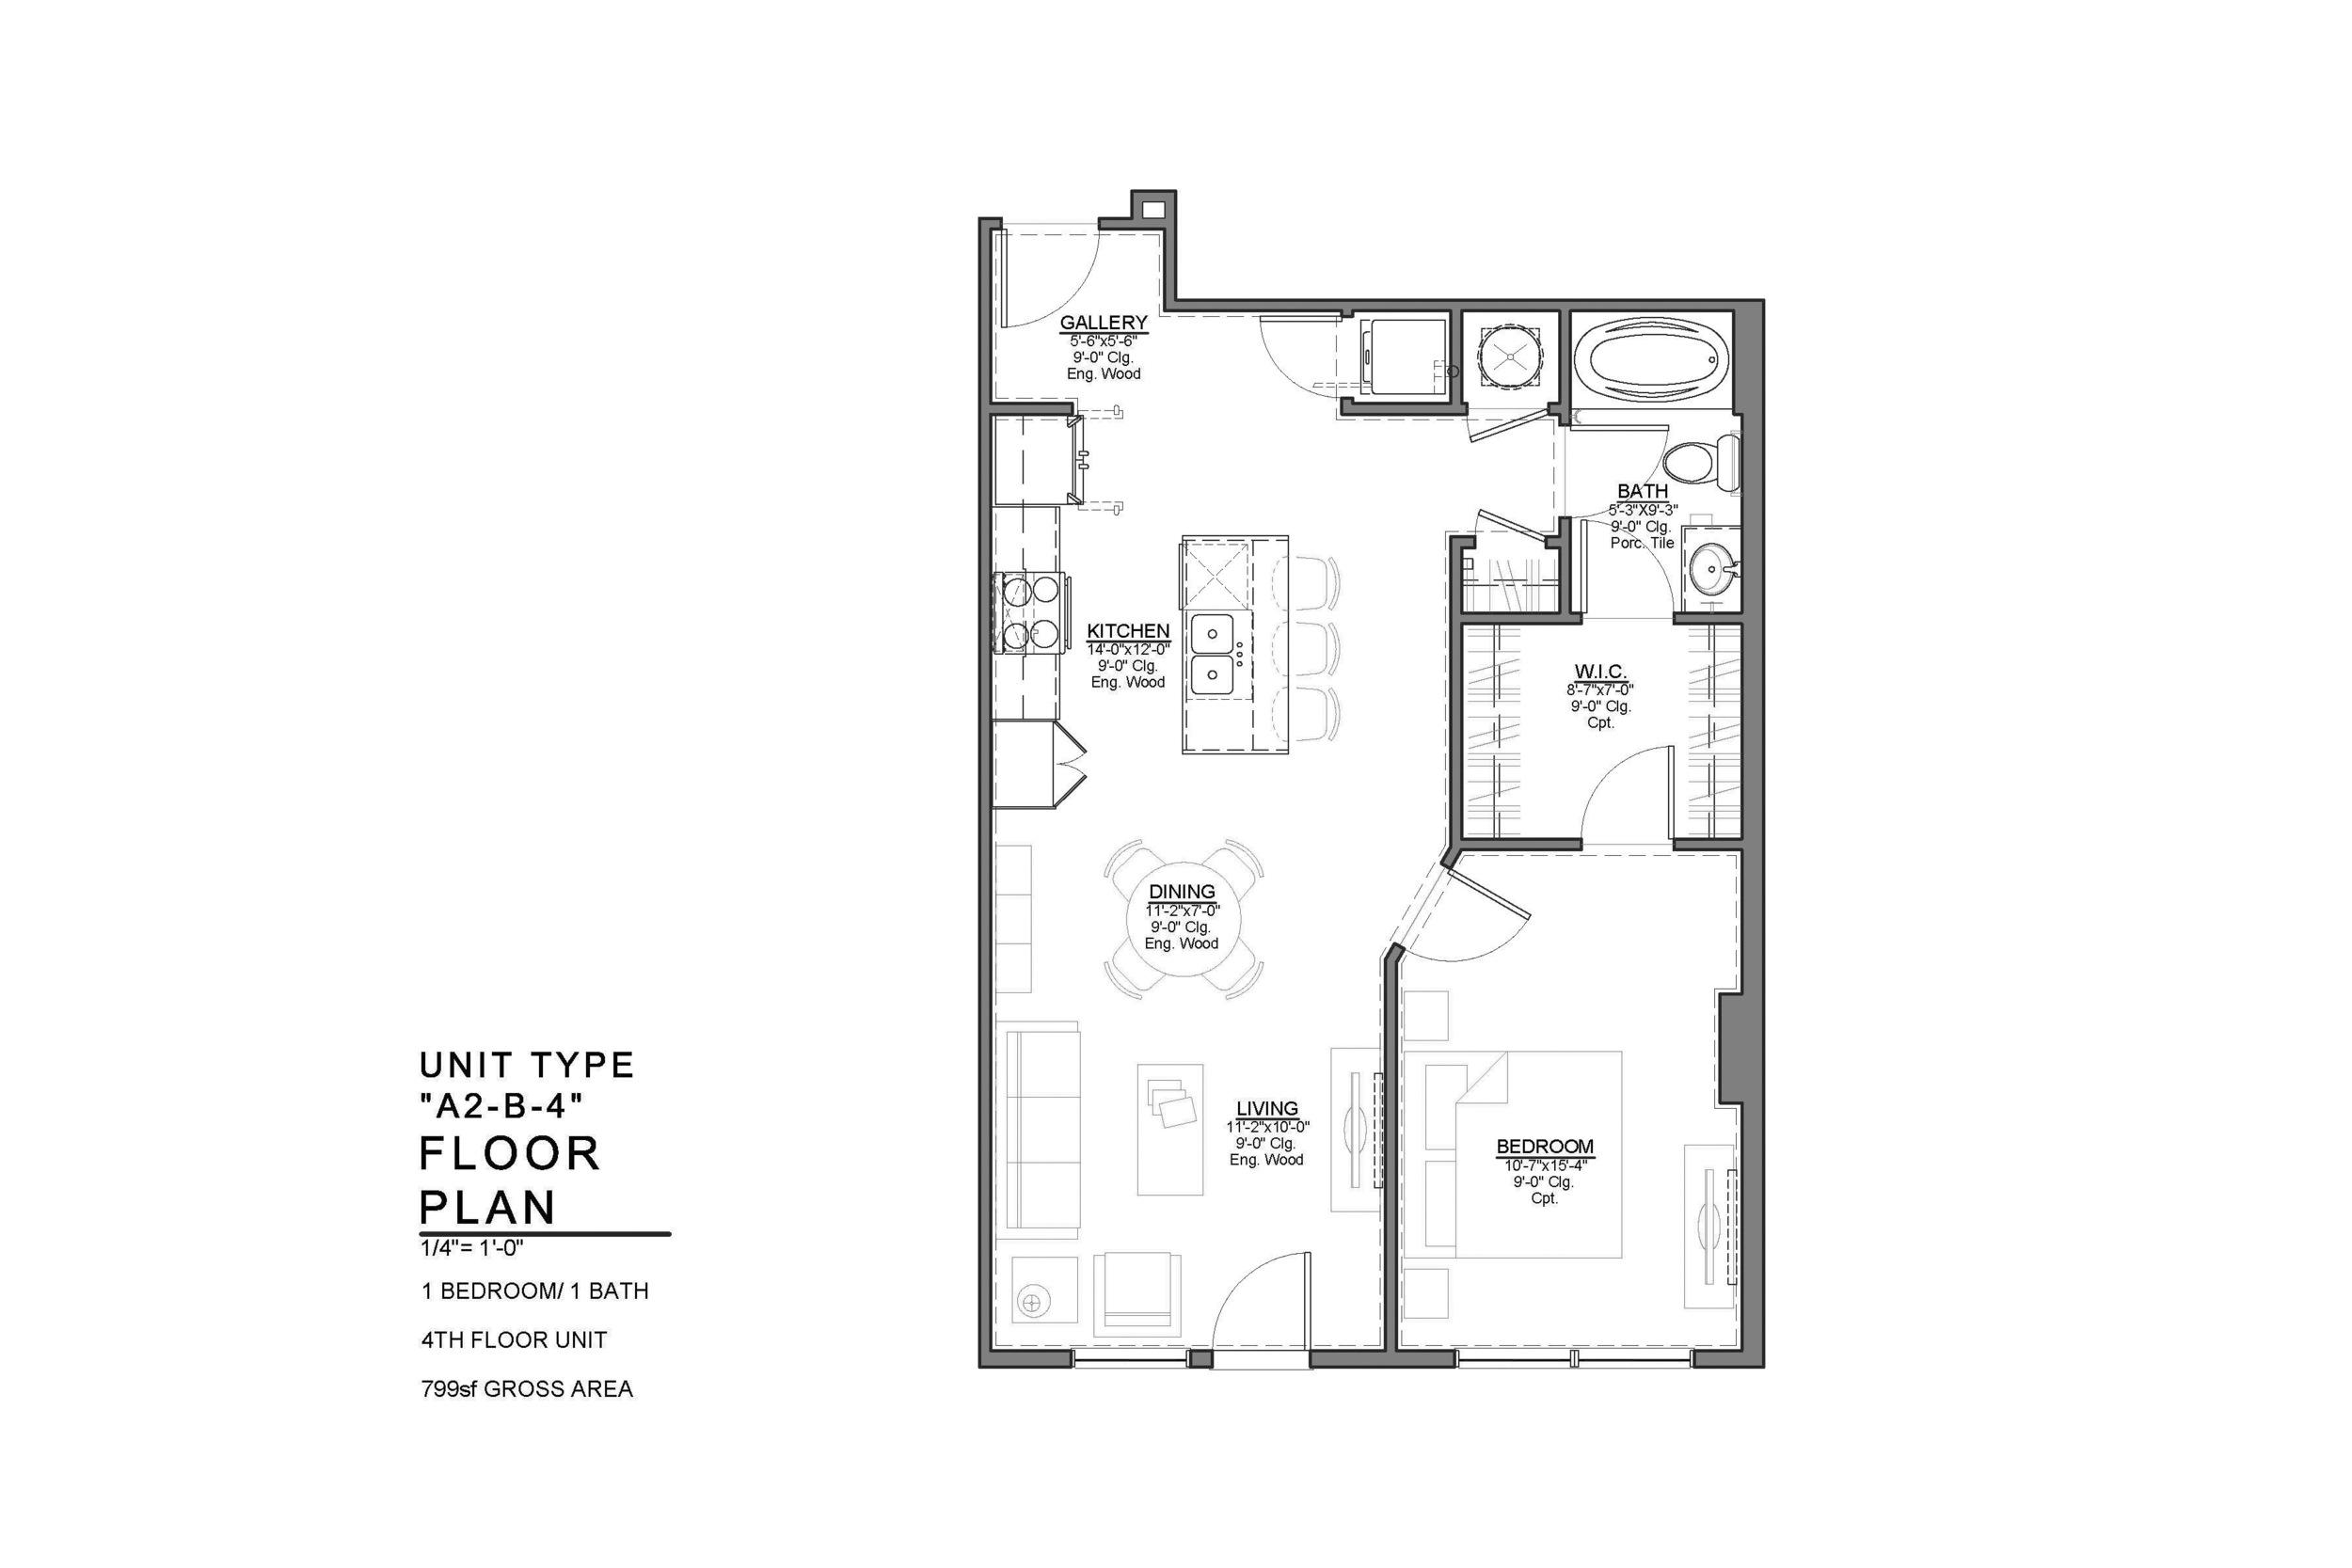 A2-B-4 FLOOR PLAN: 1 BEDROOM / 1 BATH